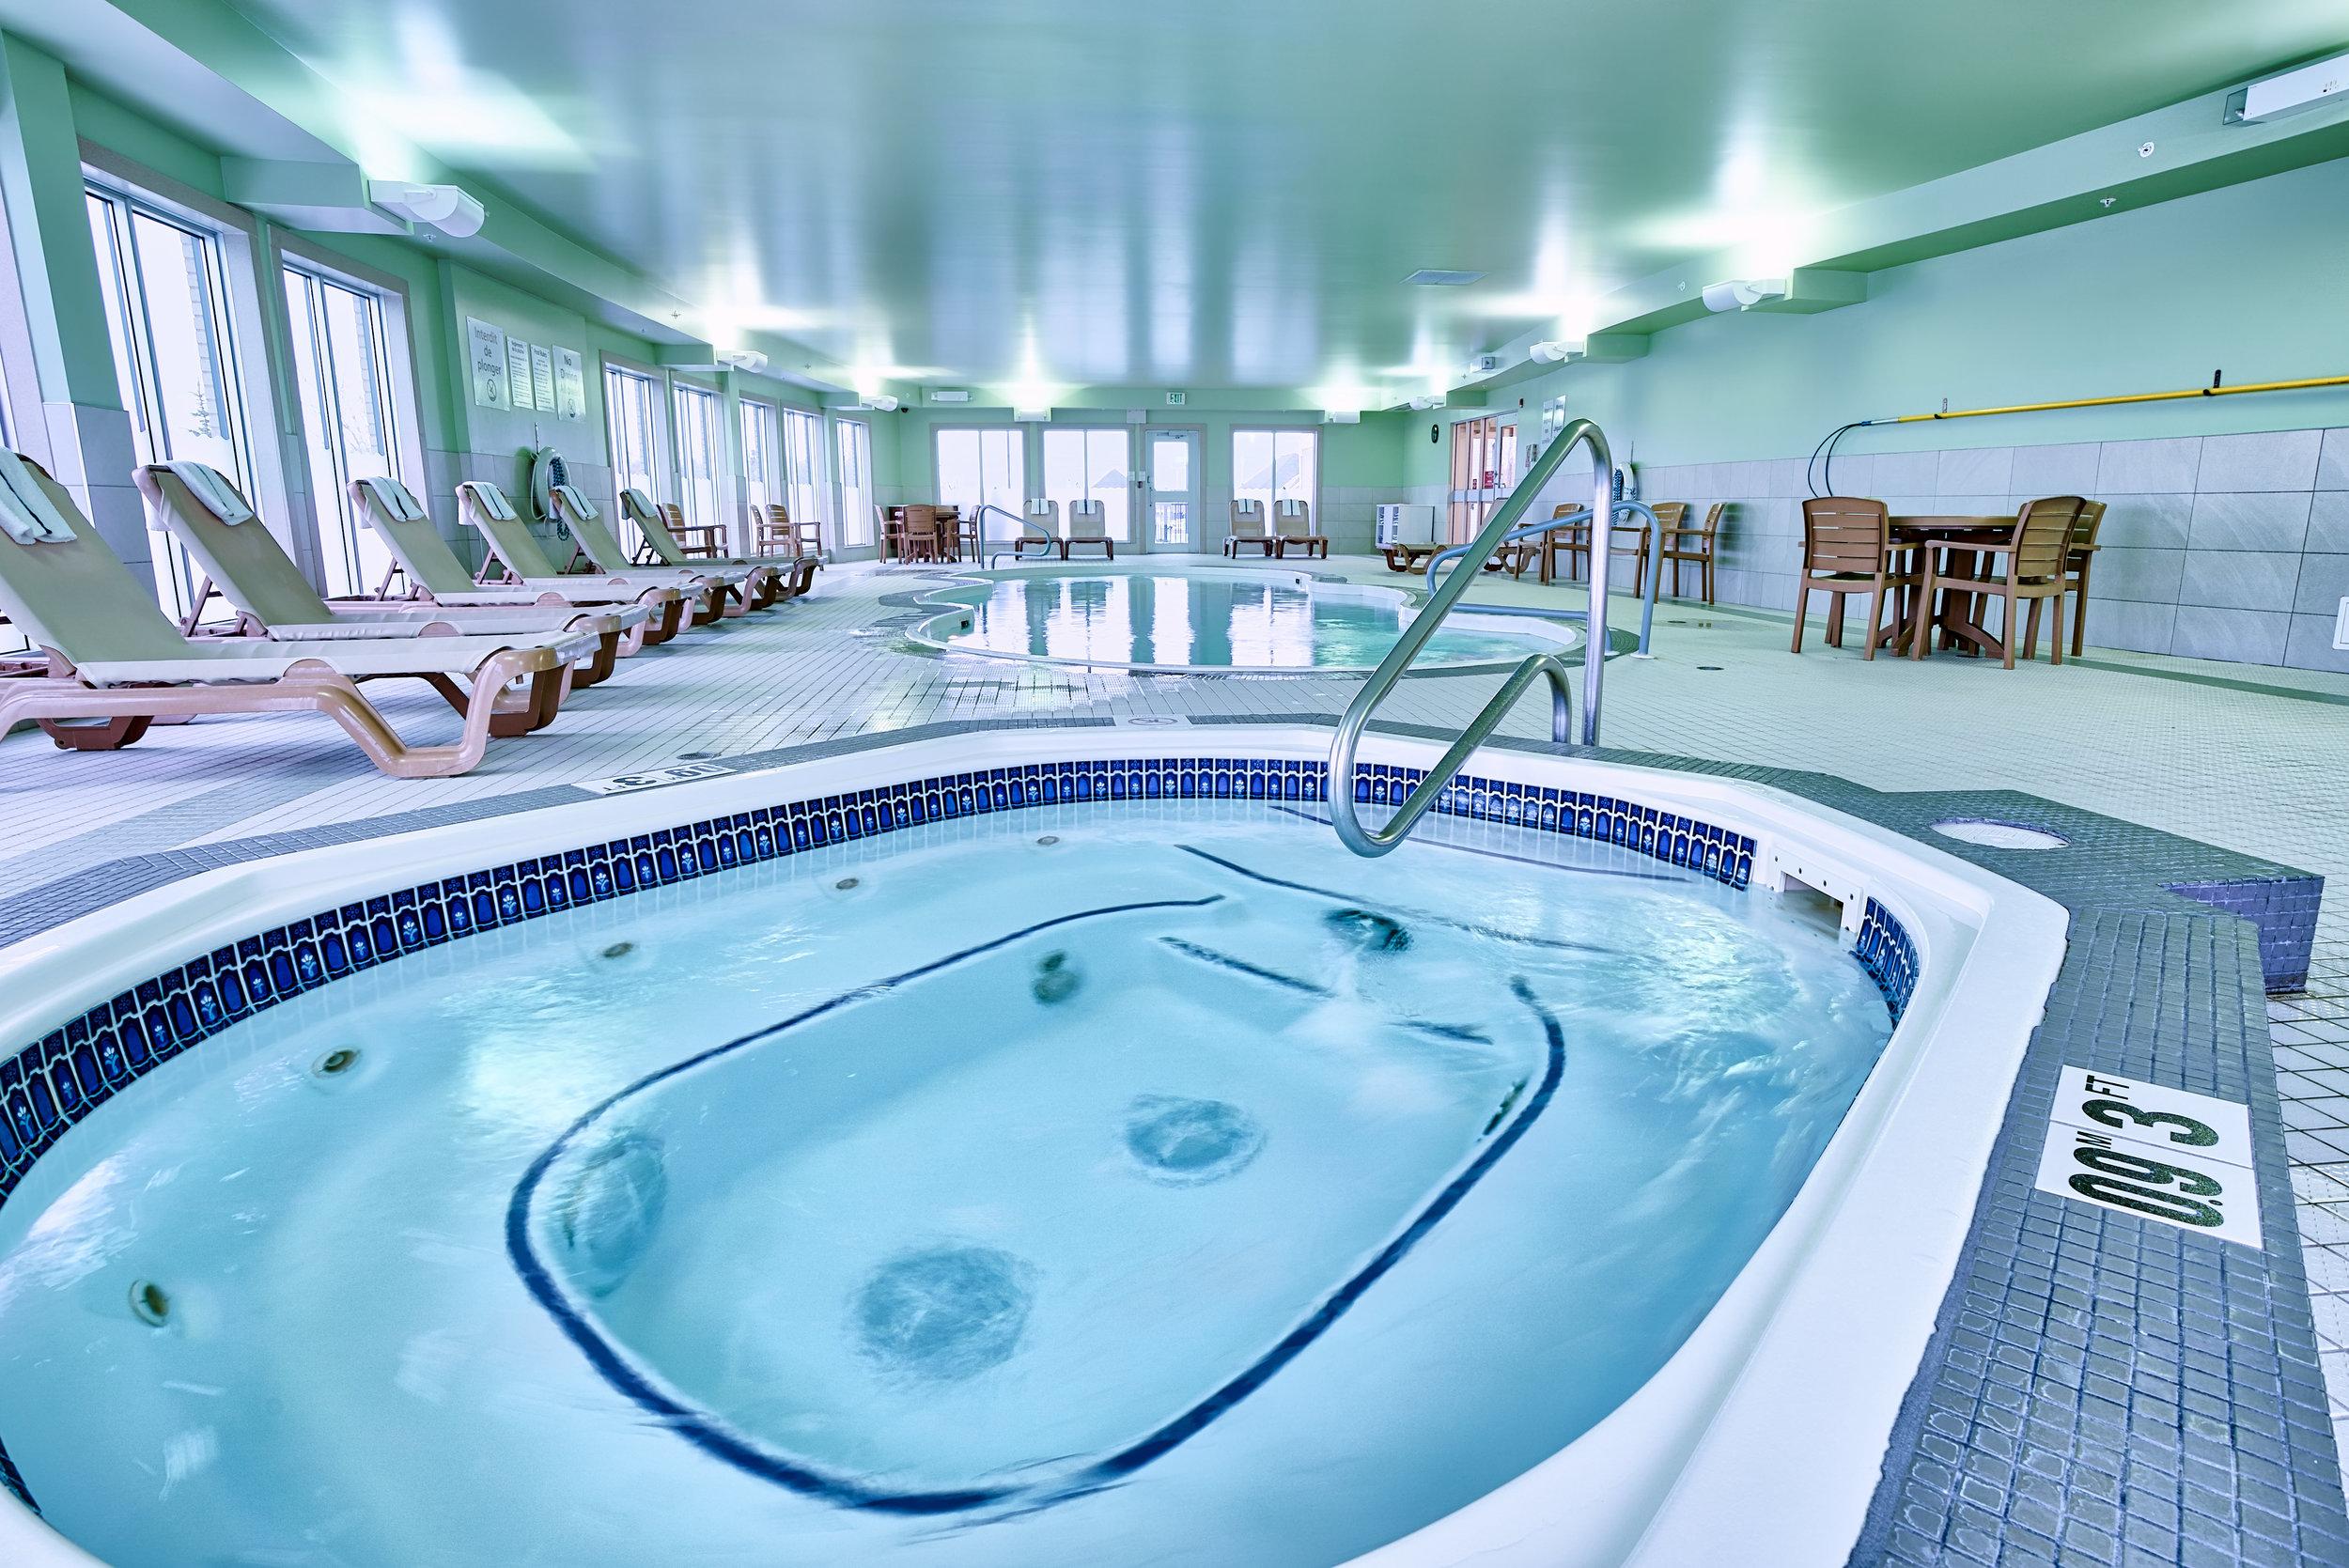 Holiday Inn Express - Hot Tub.jpg